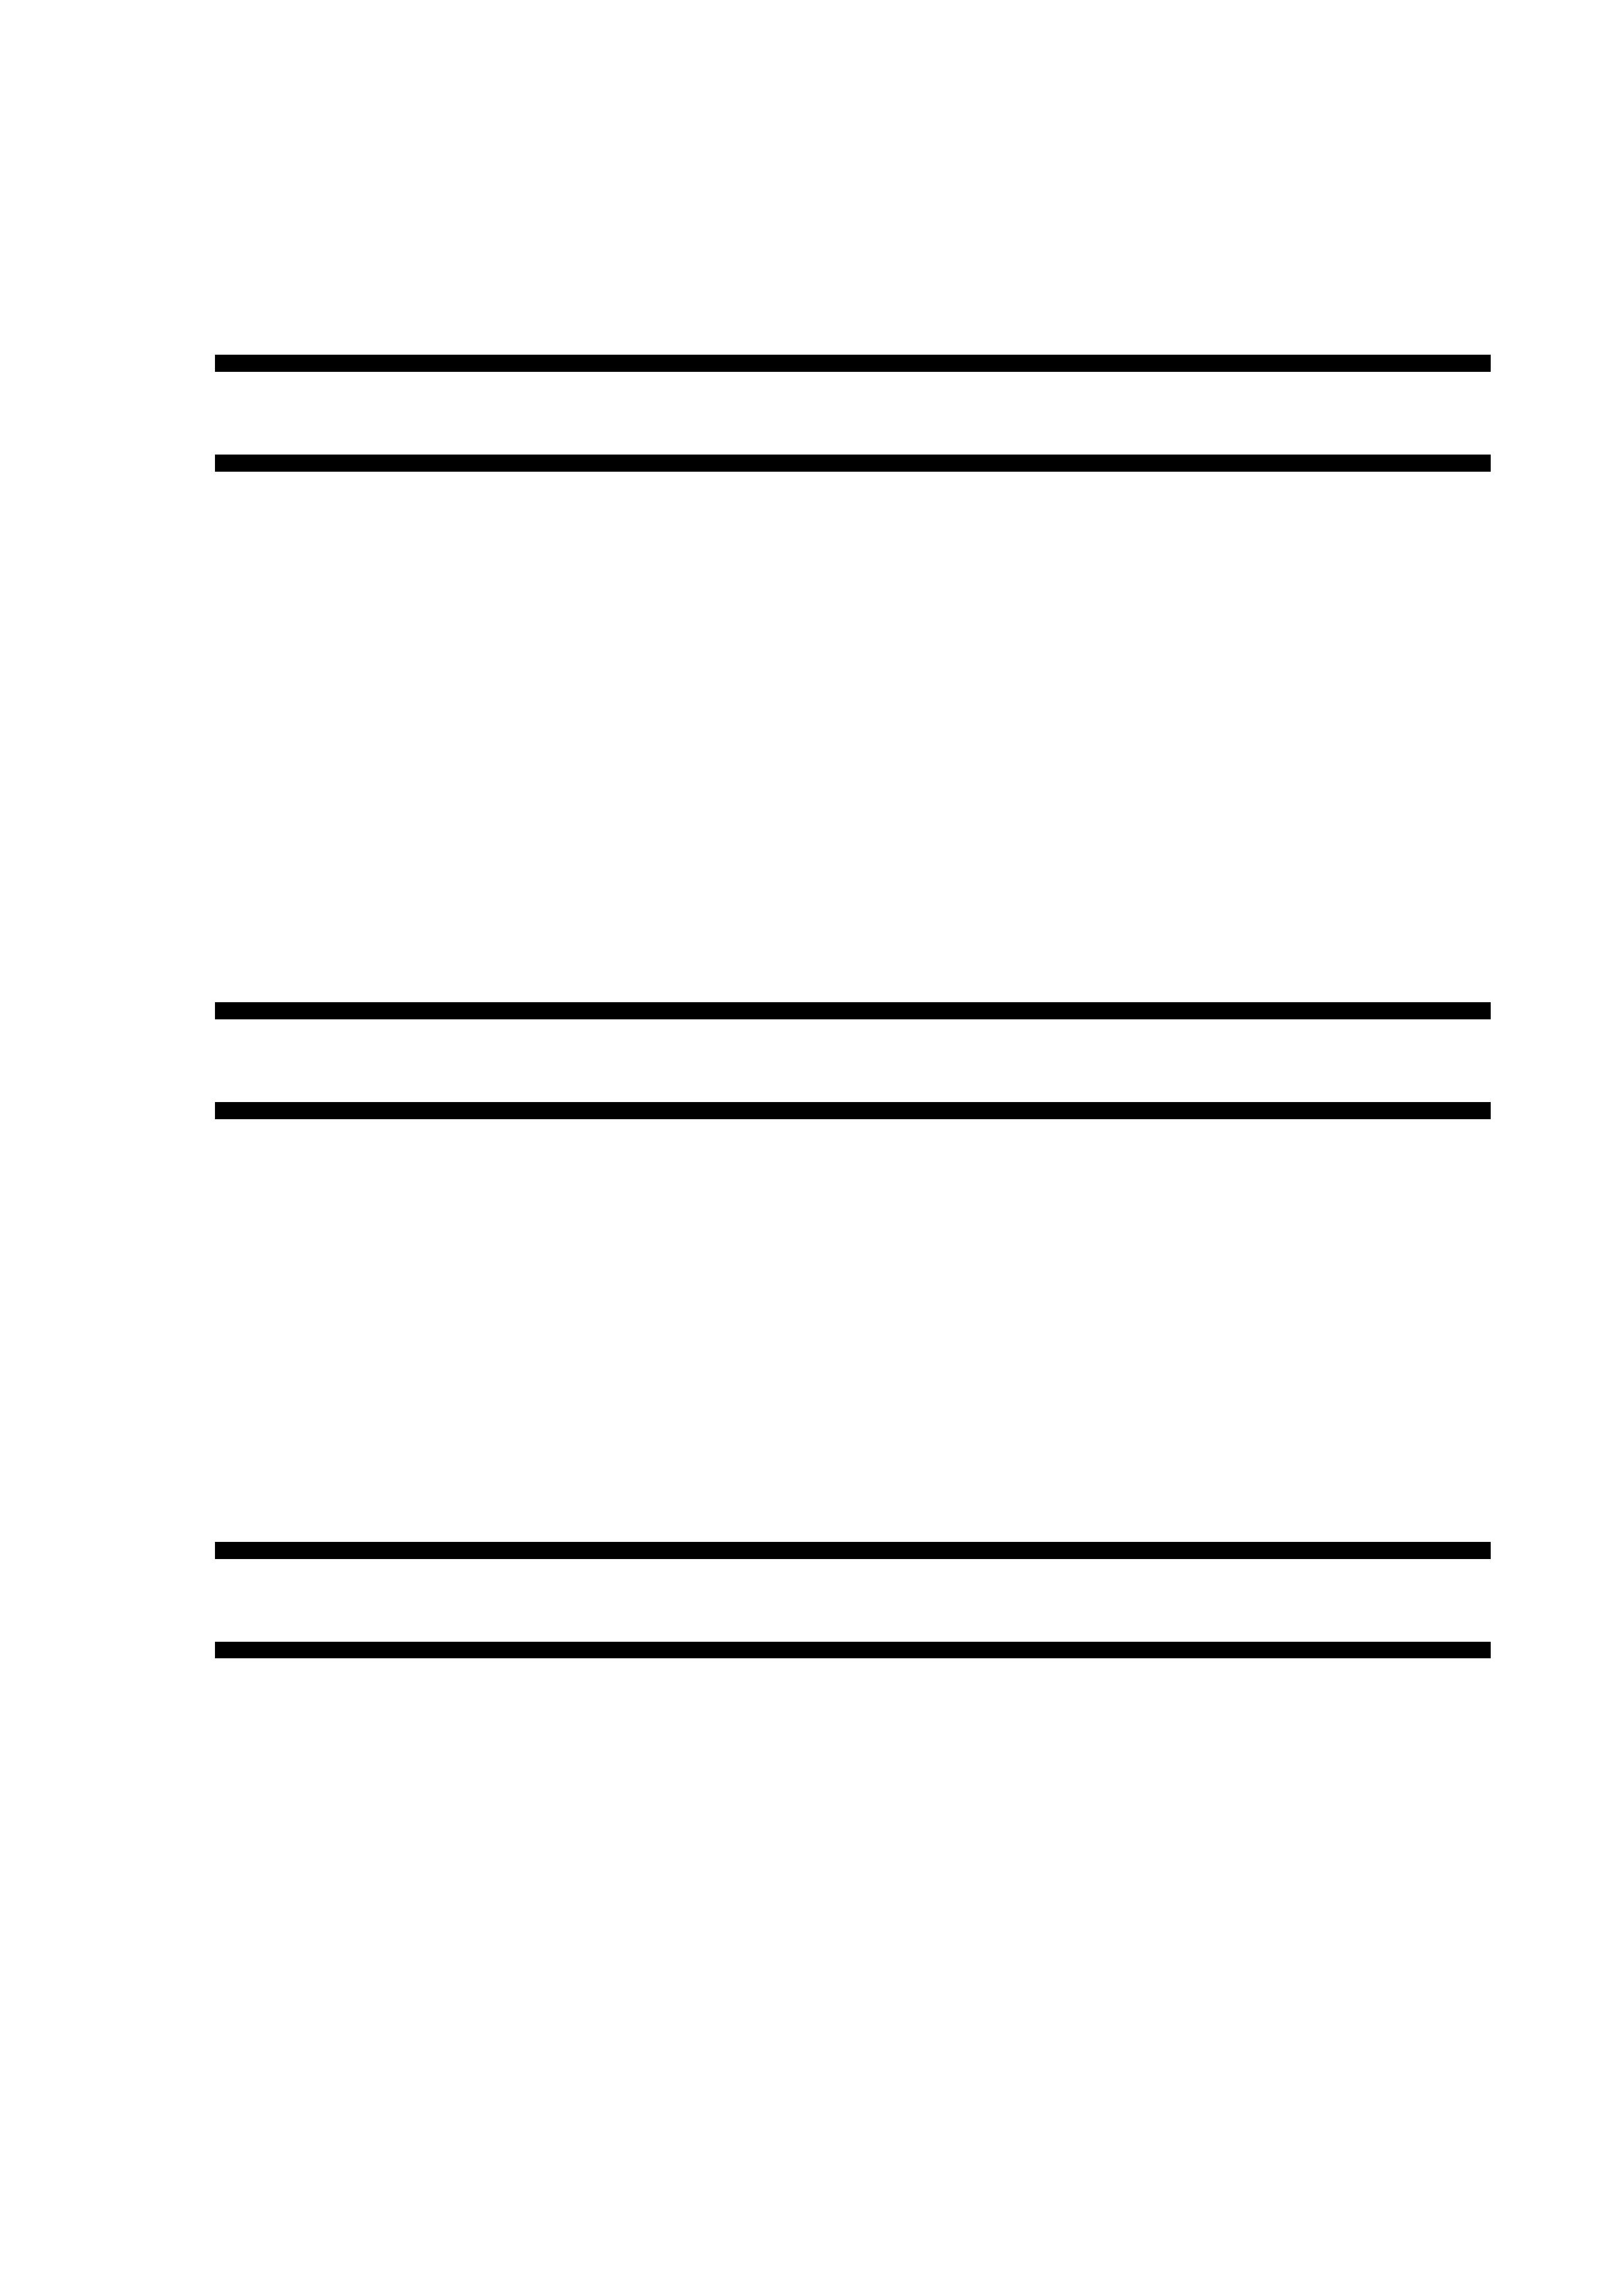 bobcat 323 service manual pdf